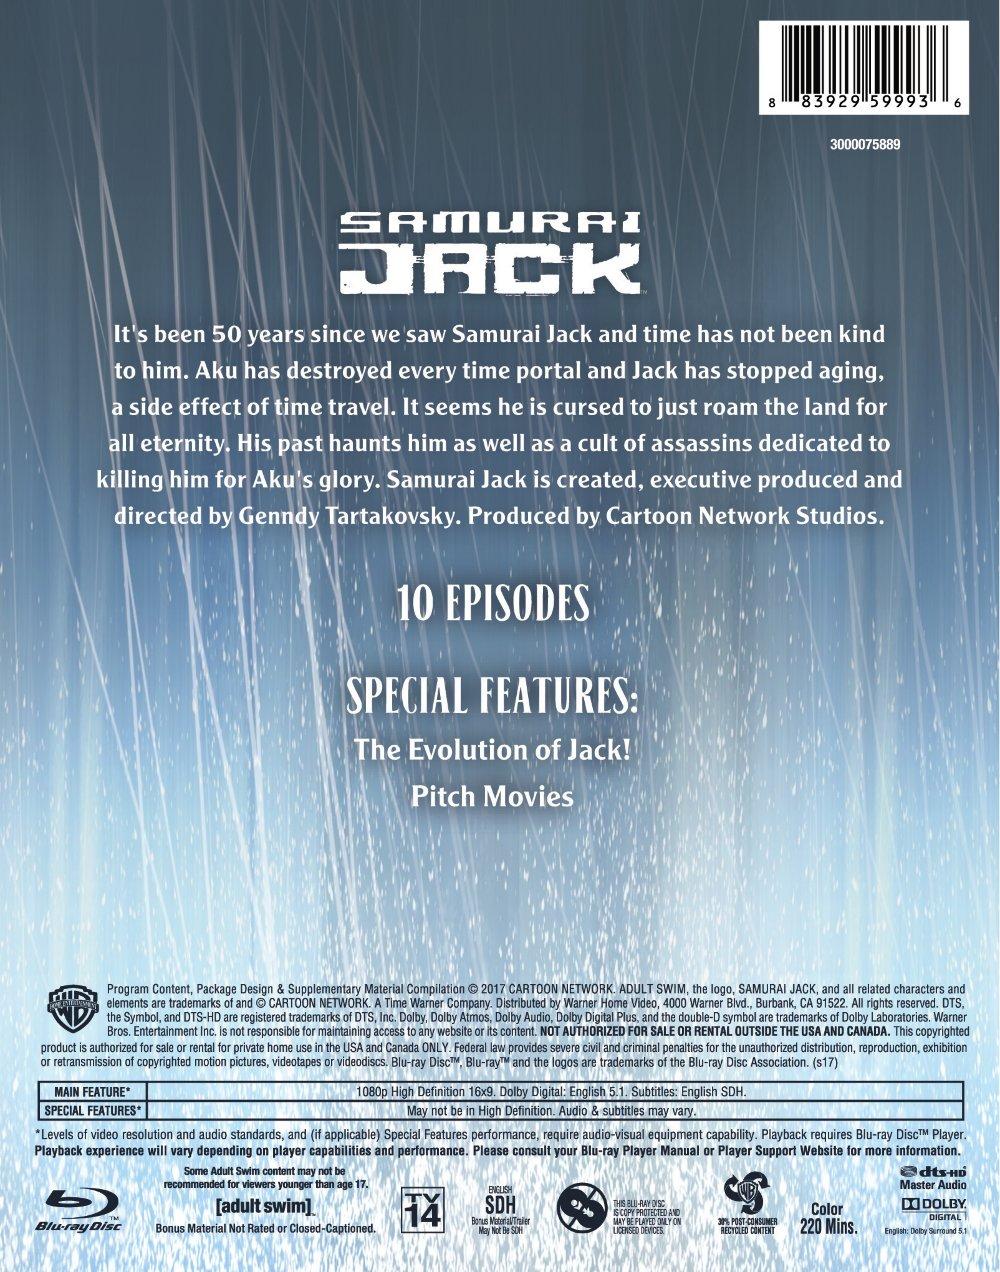 Samurai Jack Season 5 Blu-ray